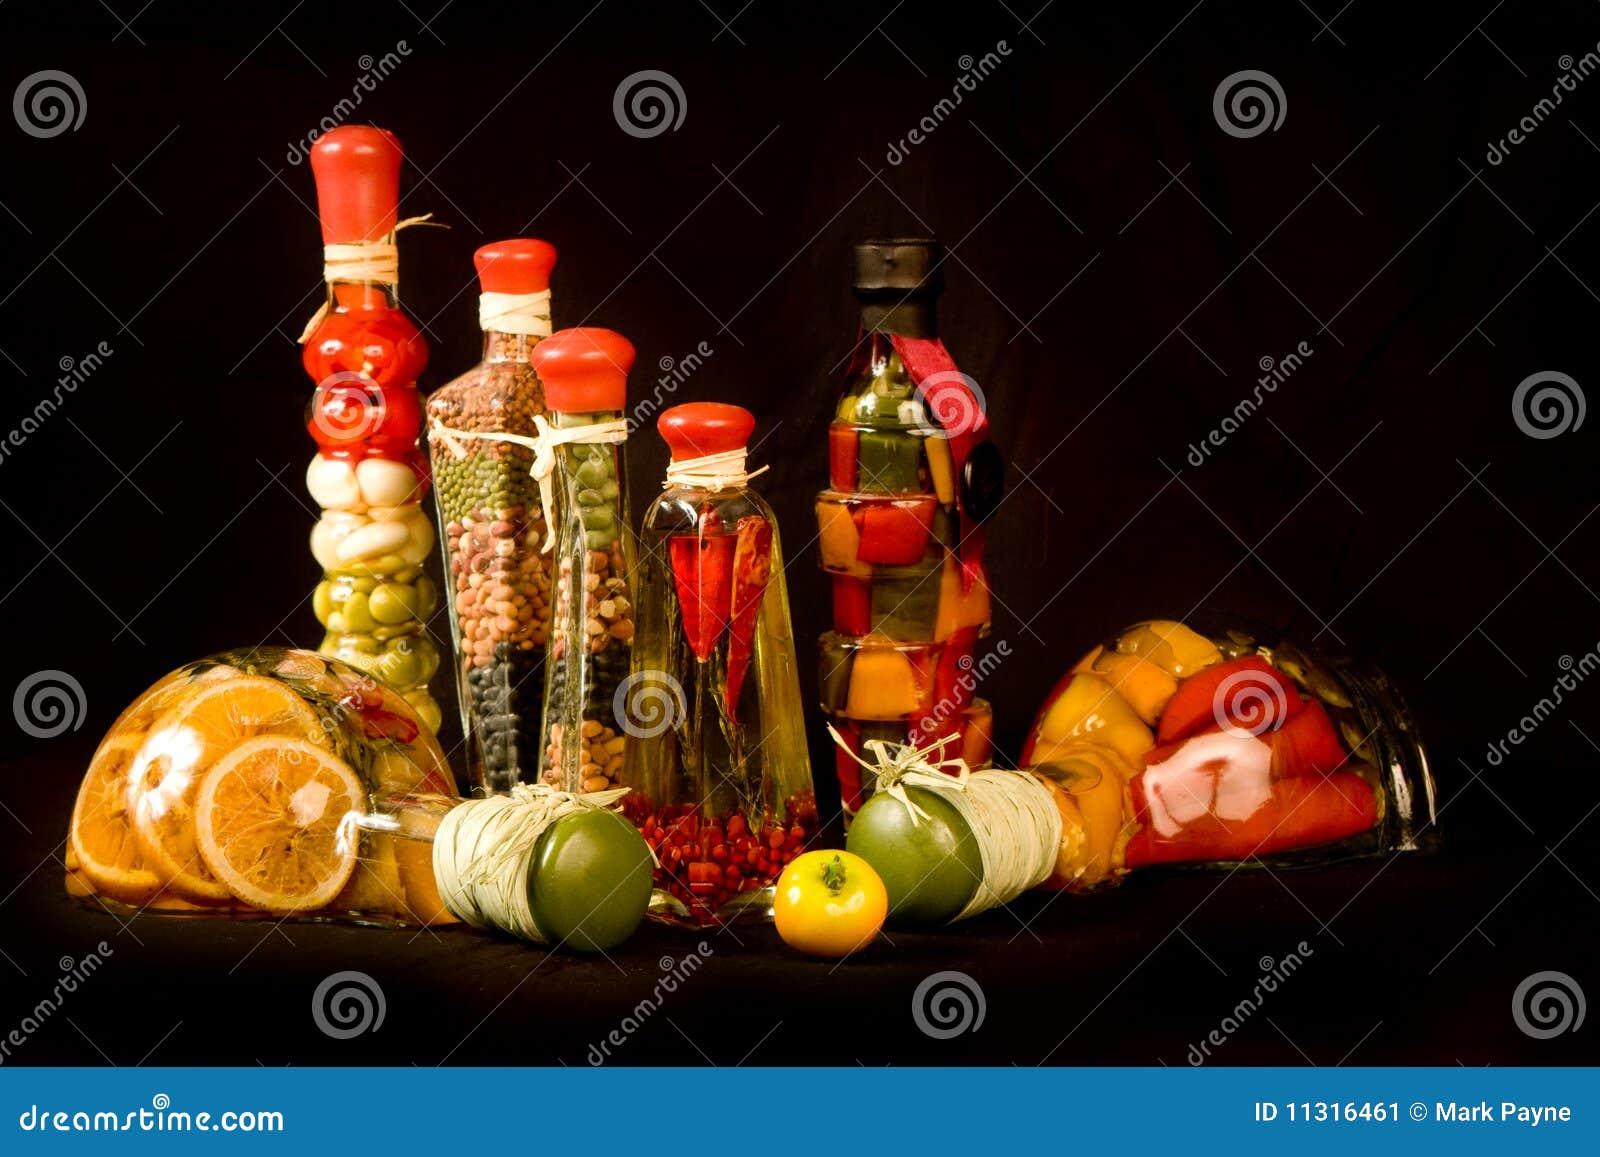 Der Feinschmecker, der Chef kocht, Peppers Gewürze und Gewürze